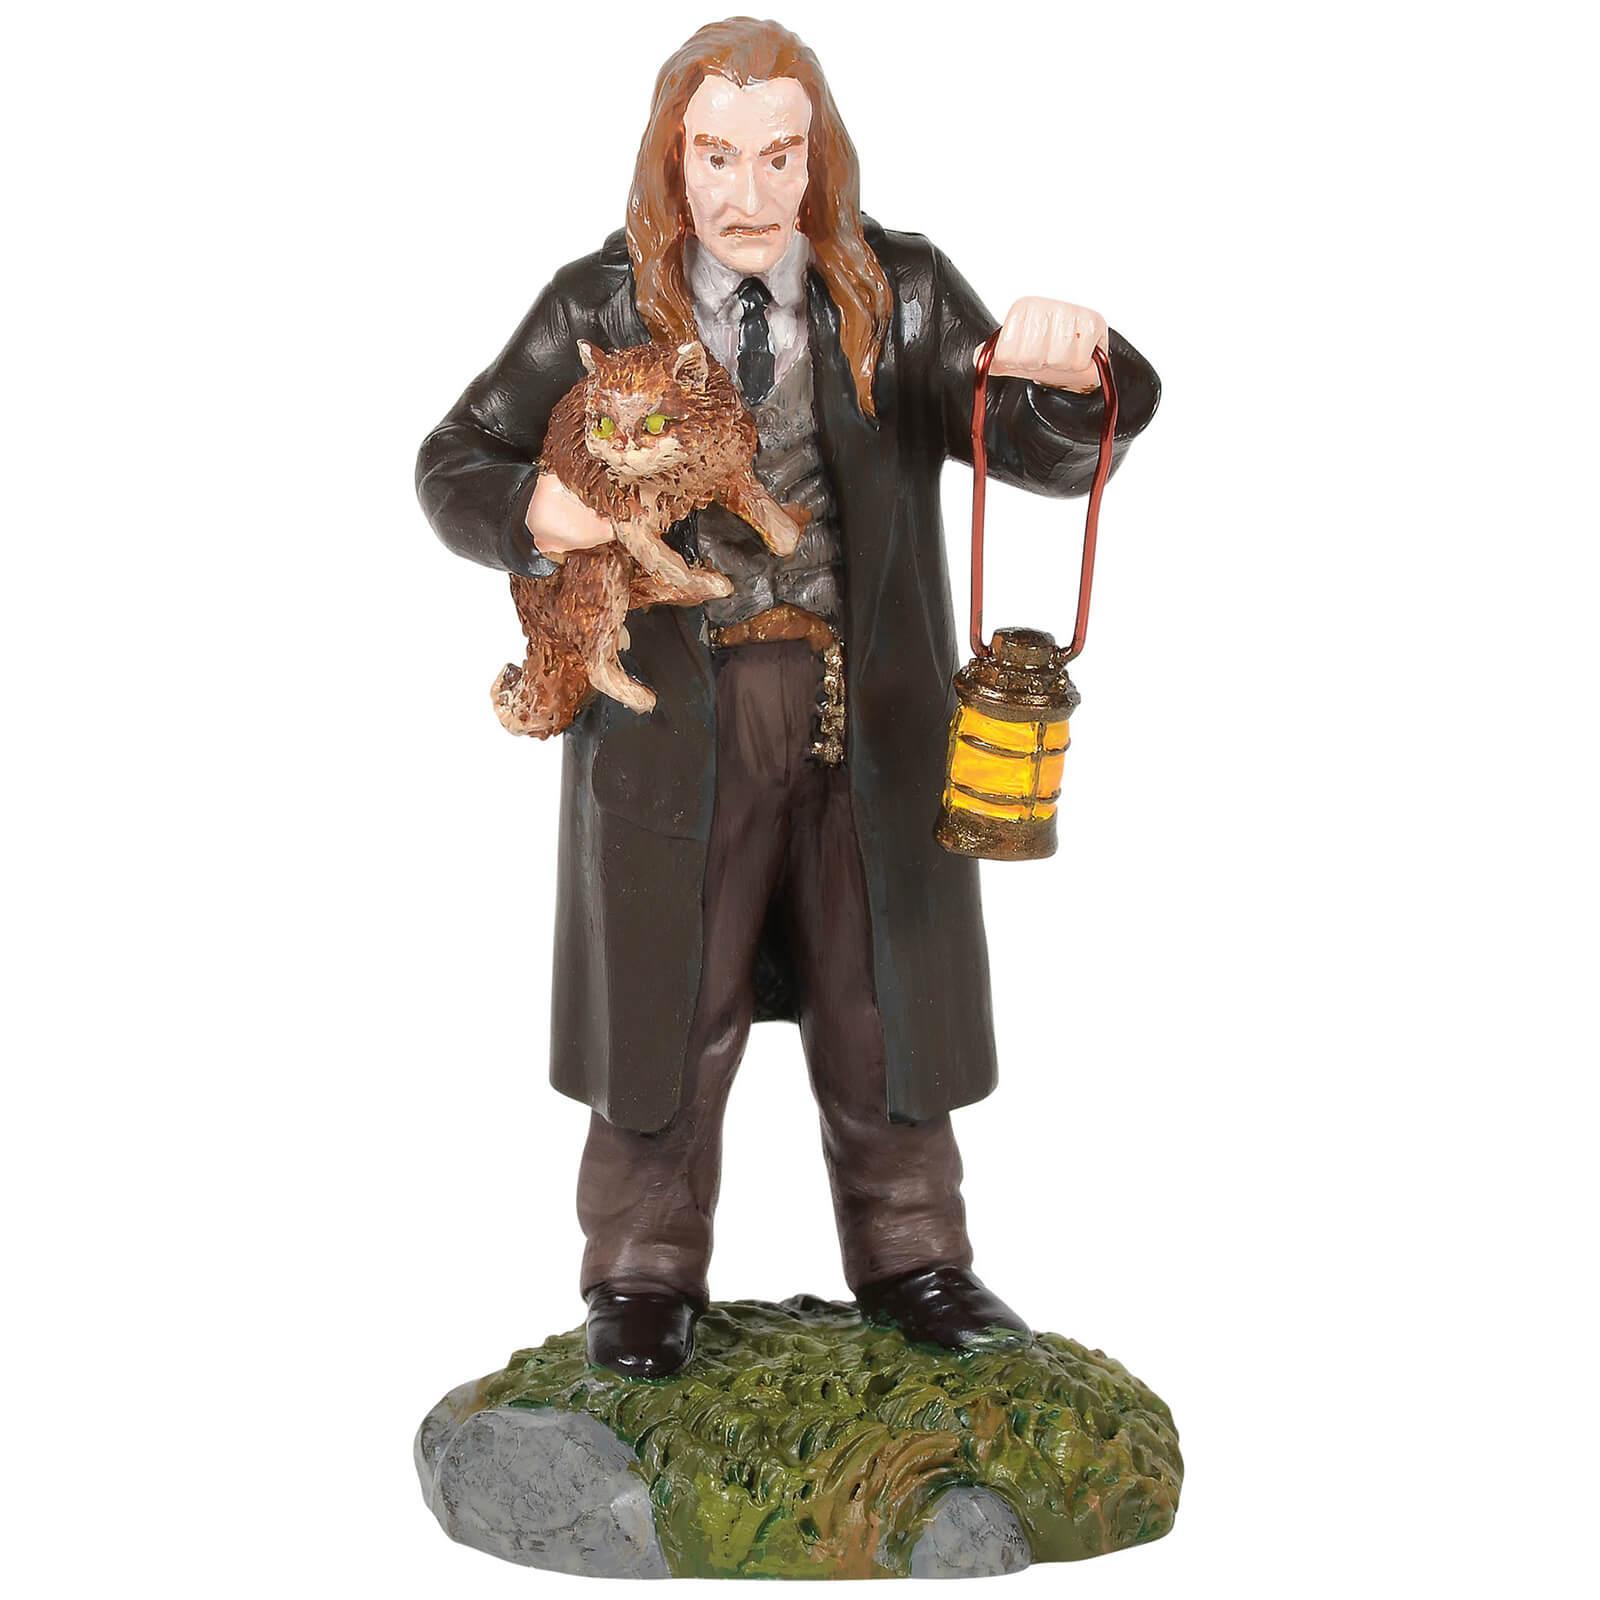 Image of Harry Potter Village Filch™ and Mrs. Norris™ 8cm